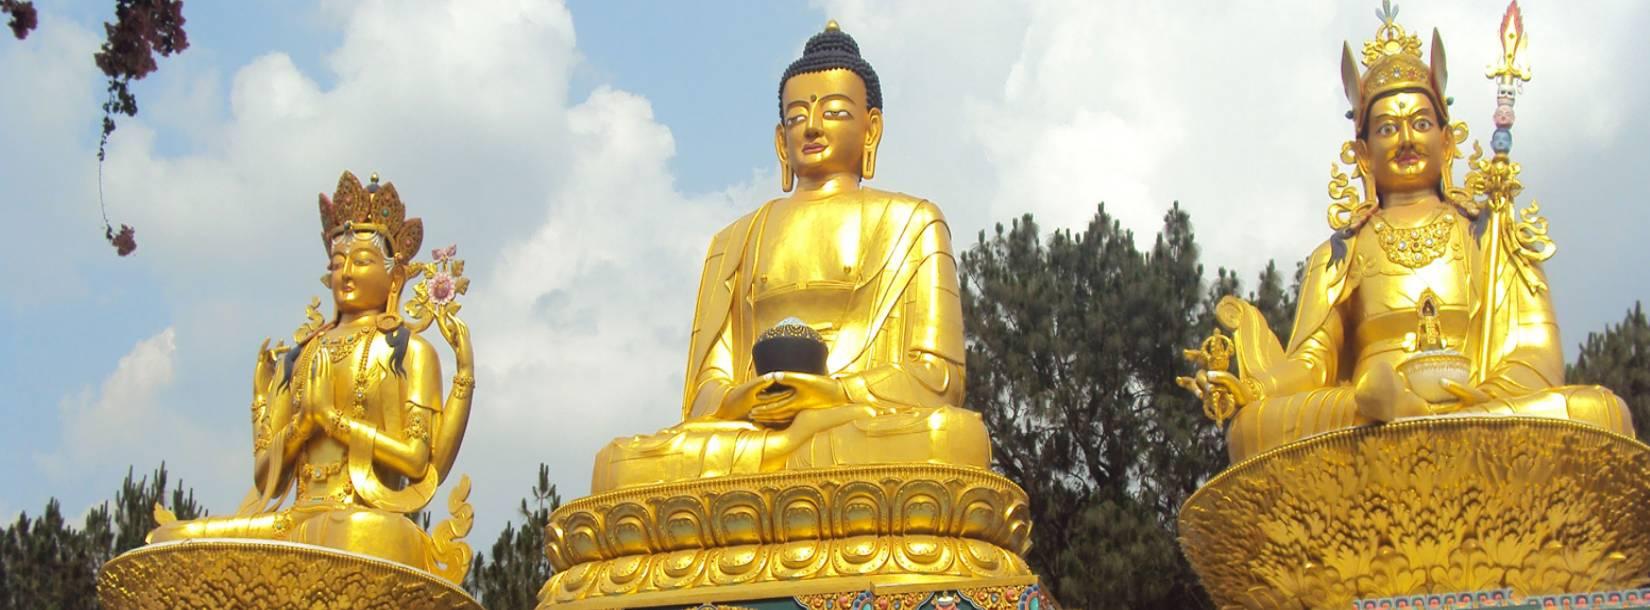 The Birth Place of Lord Buddha | Bhuddha Circuits in Nepal